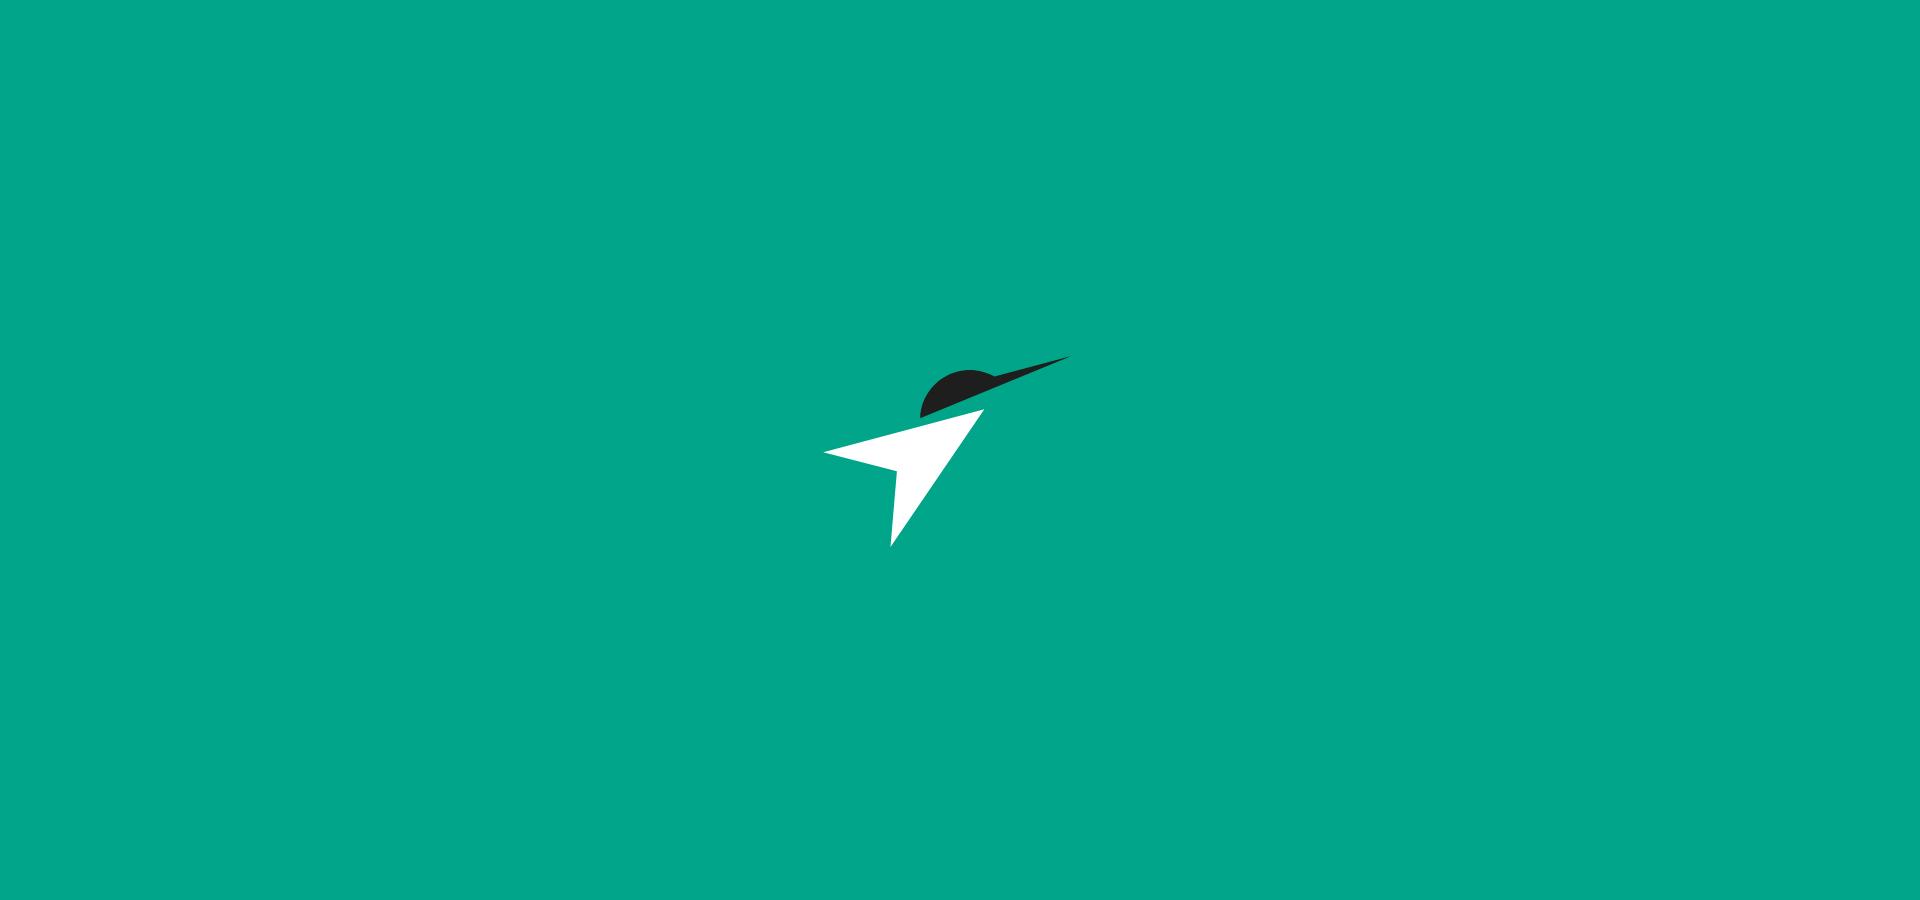 Dominik-Pacholczyk-Logo-Design-Collection-04